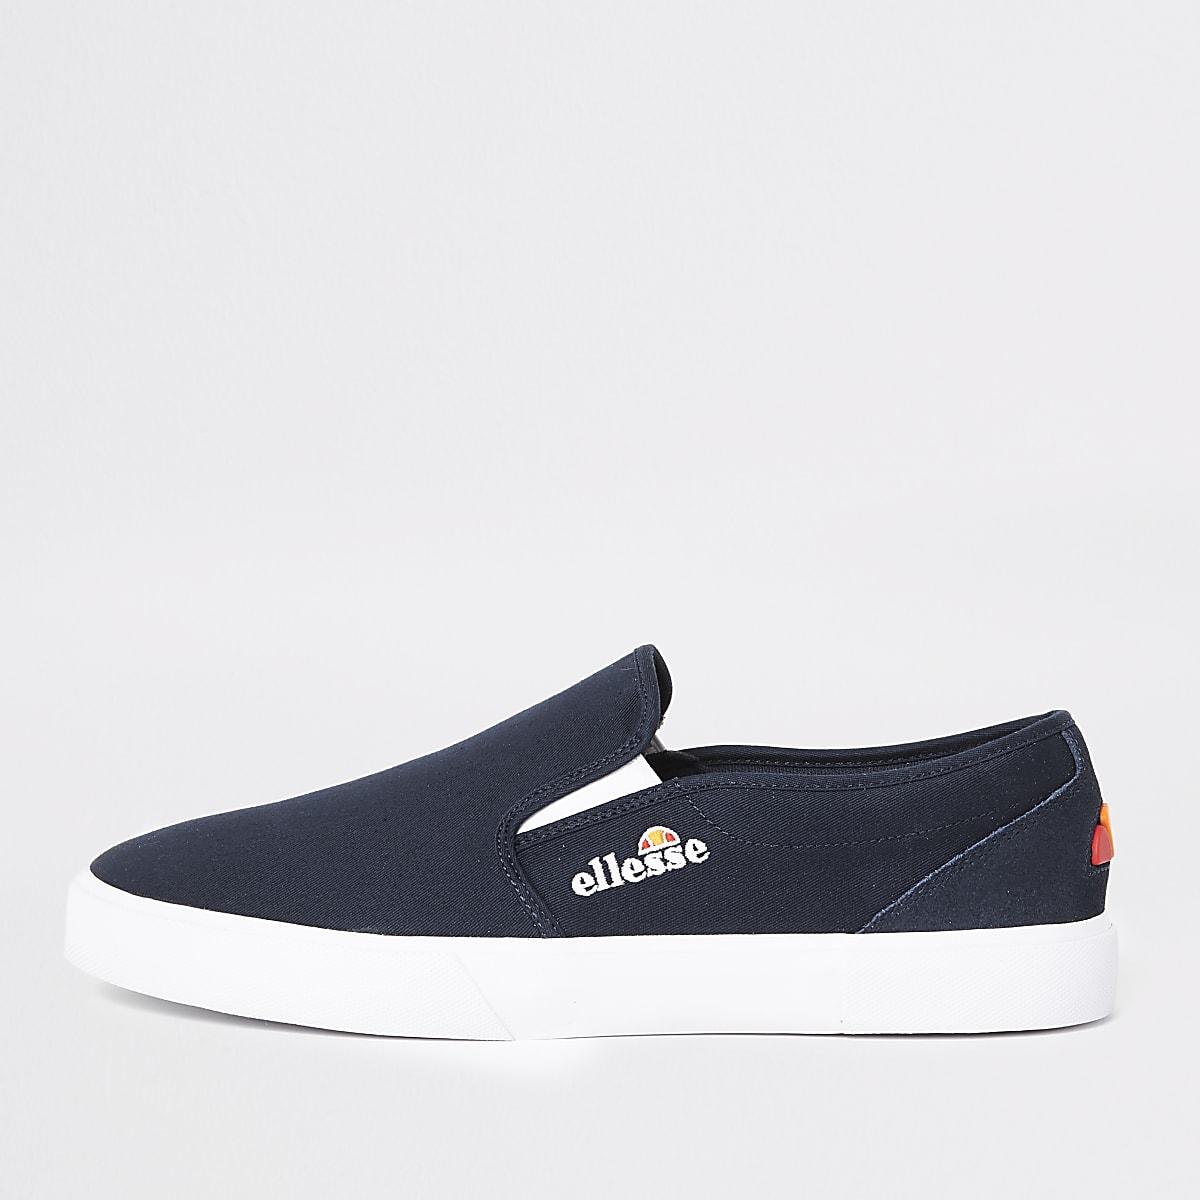 Ellesse – Prazzo – Marineblaue Sneaker